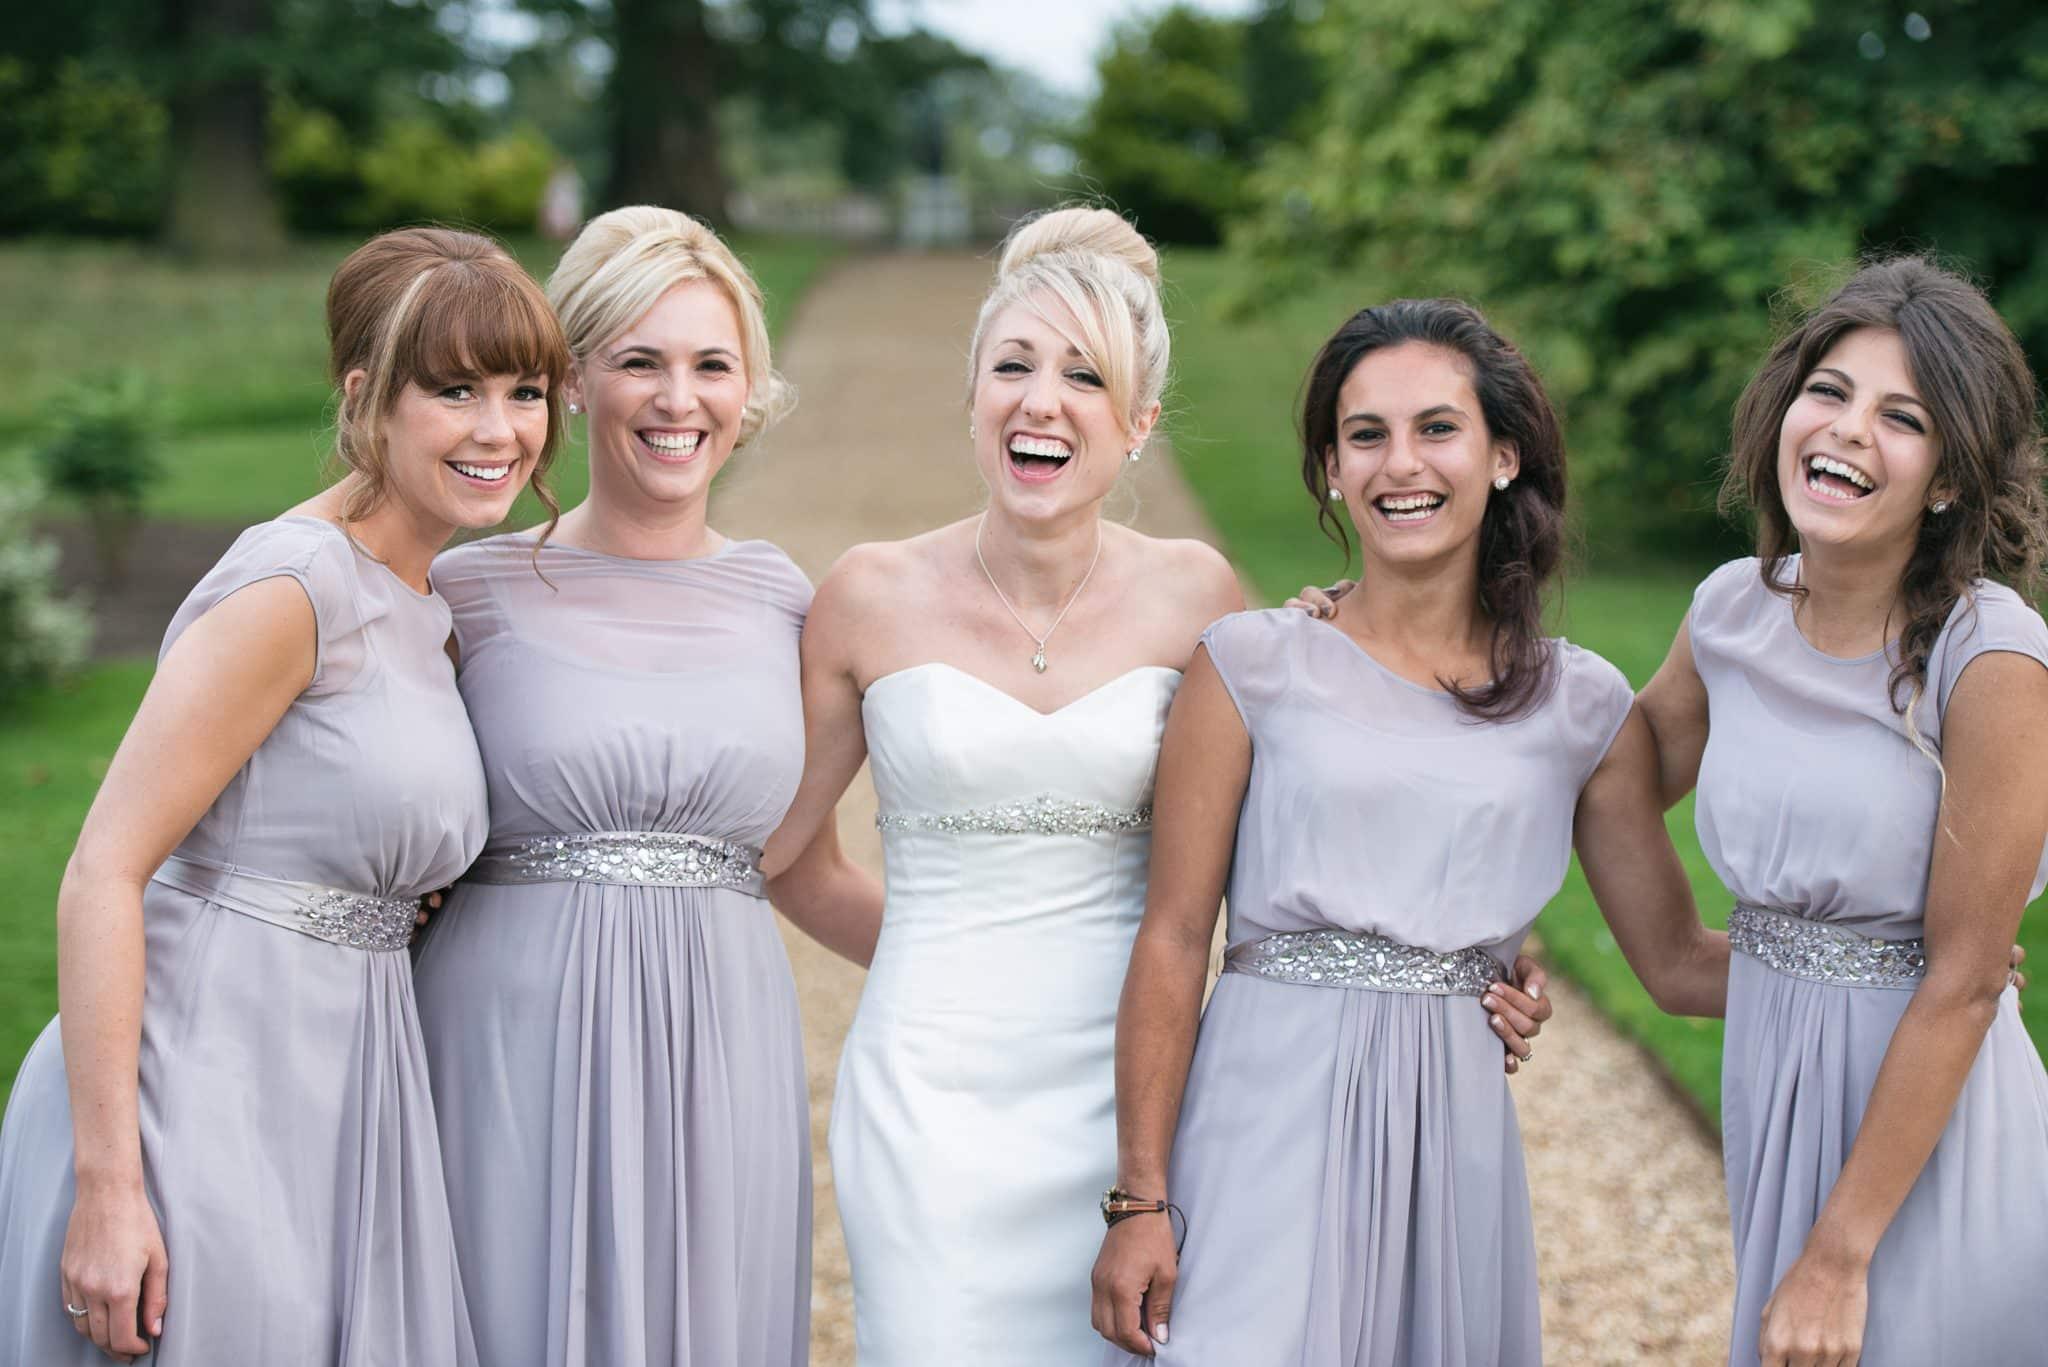 wedding photo checklist, first kiss, Wedding Photographer Milton Keynes, Milton Keynes Wedding Photographer